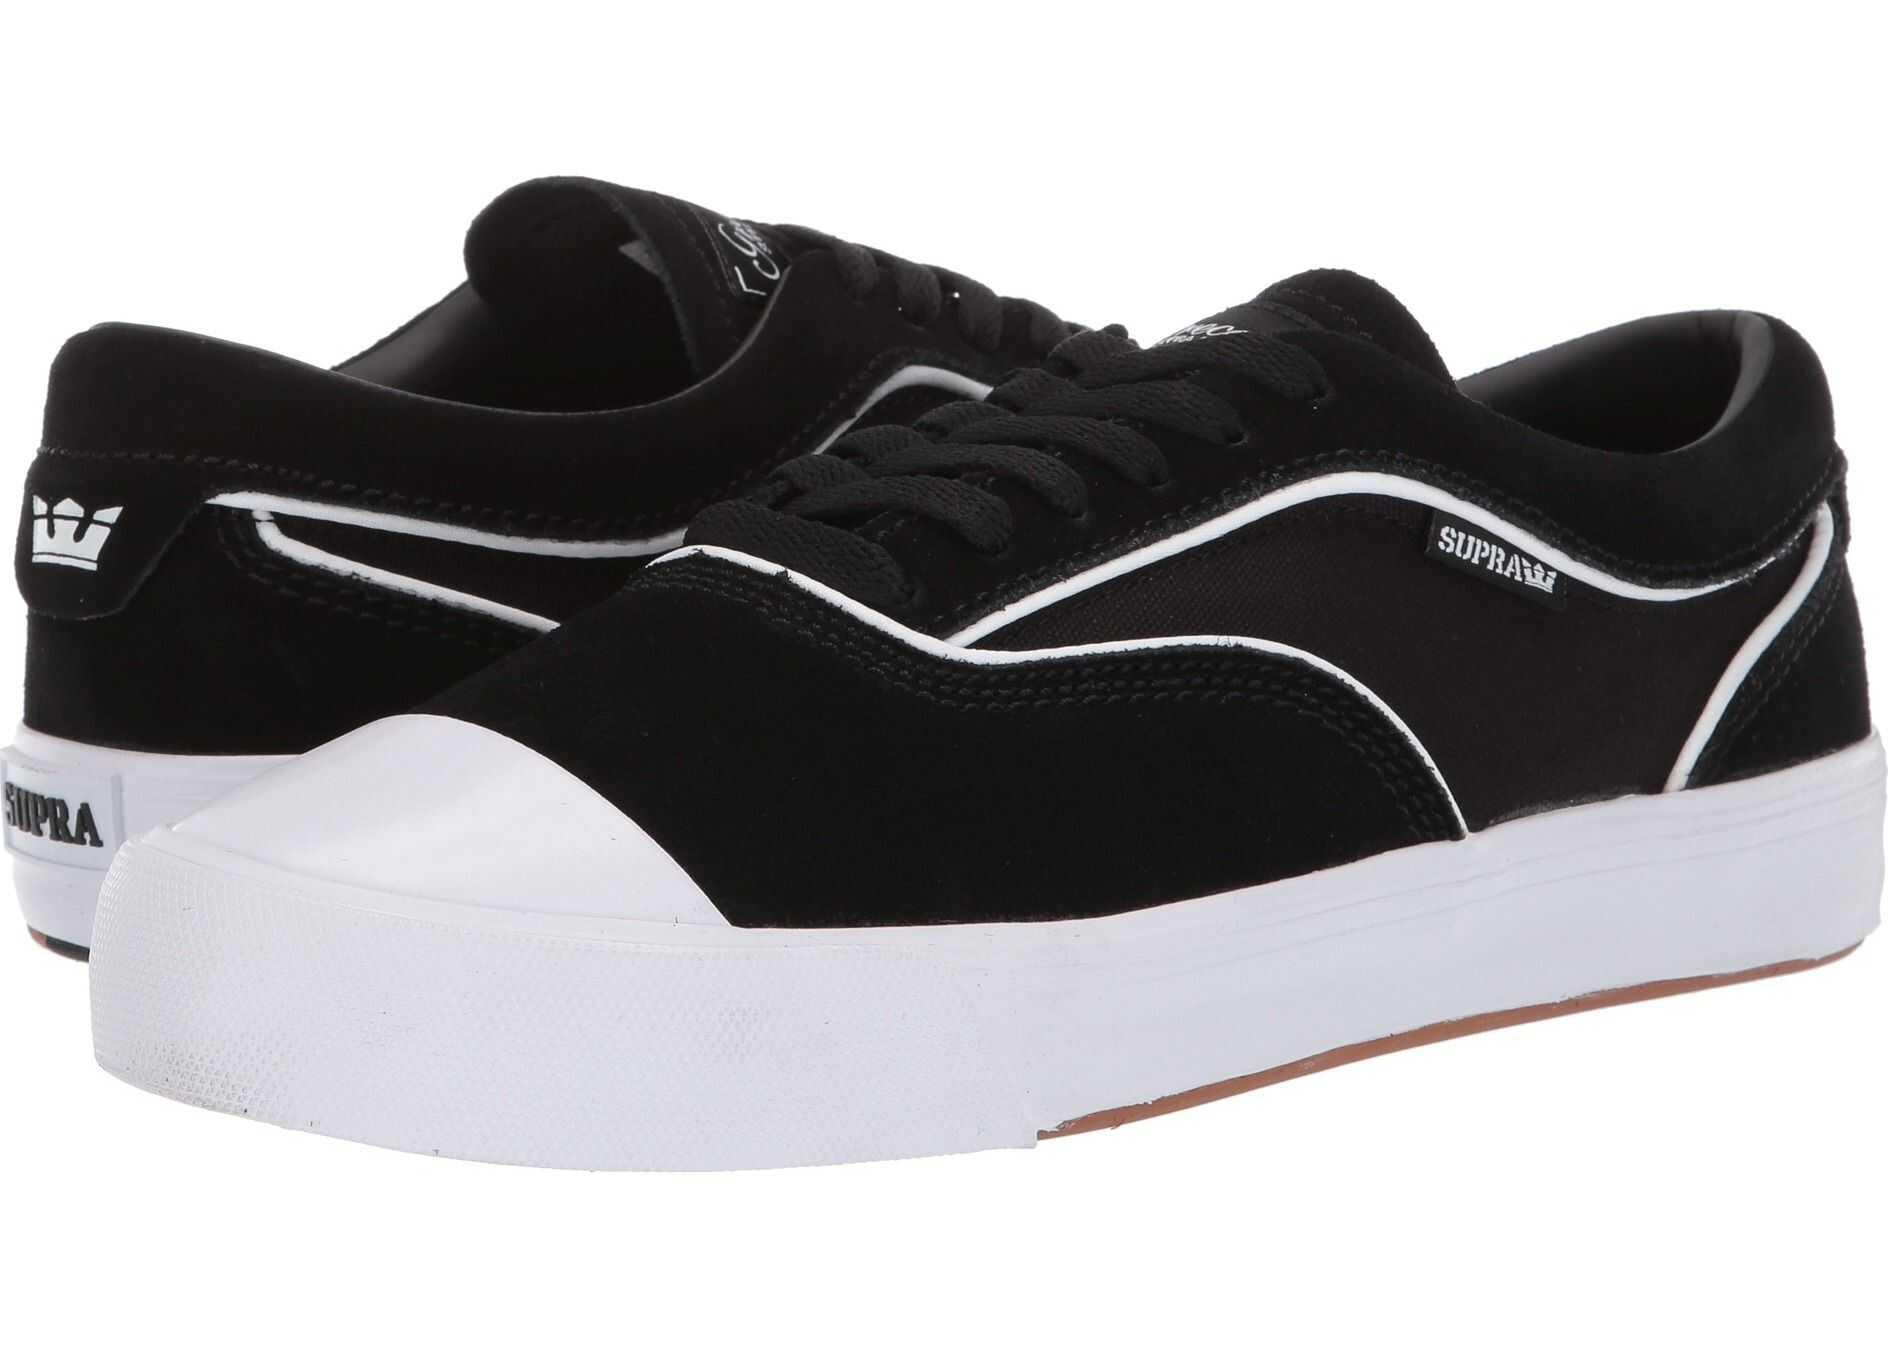 Supra Hammer VTG Black/White